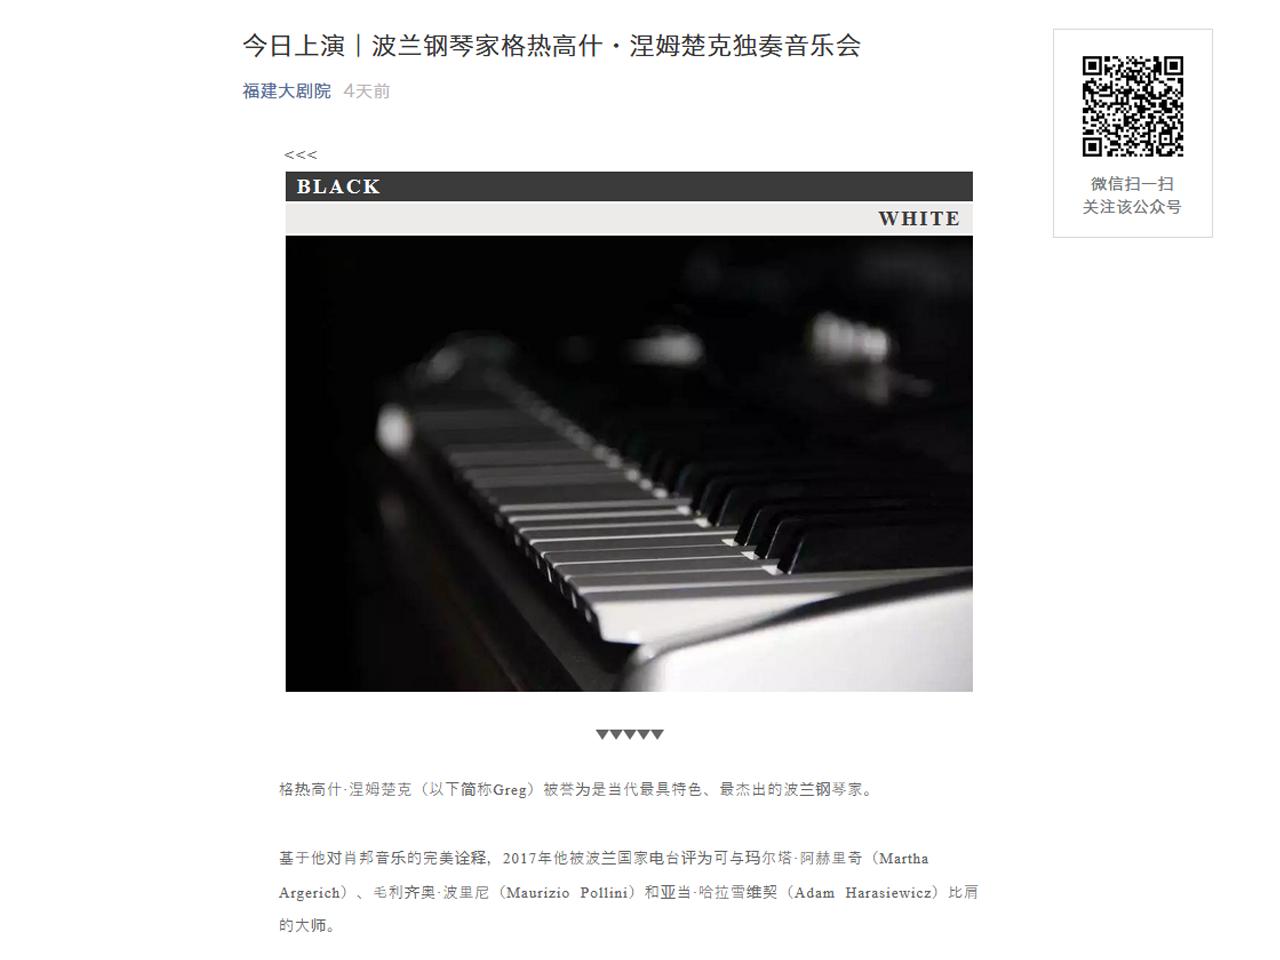 20191024_mp.weixin.qq.com